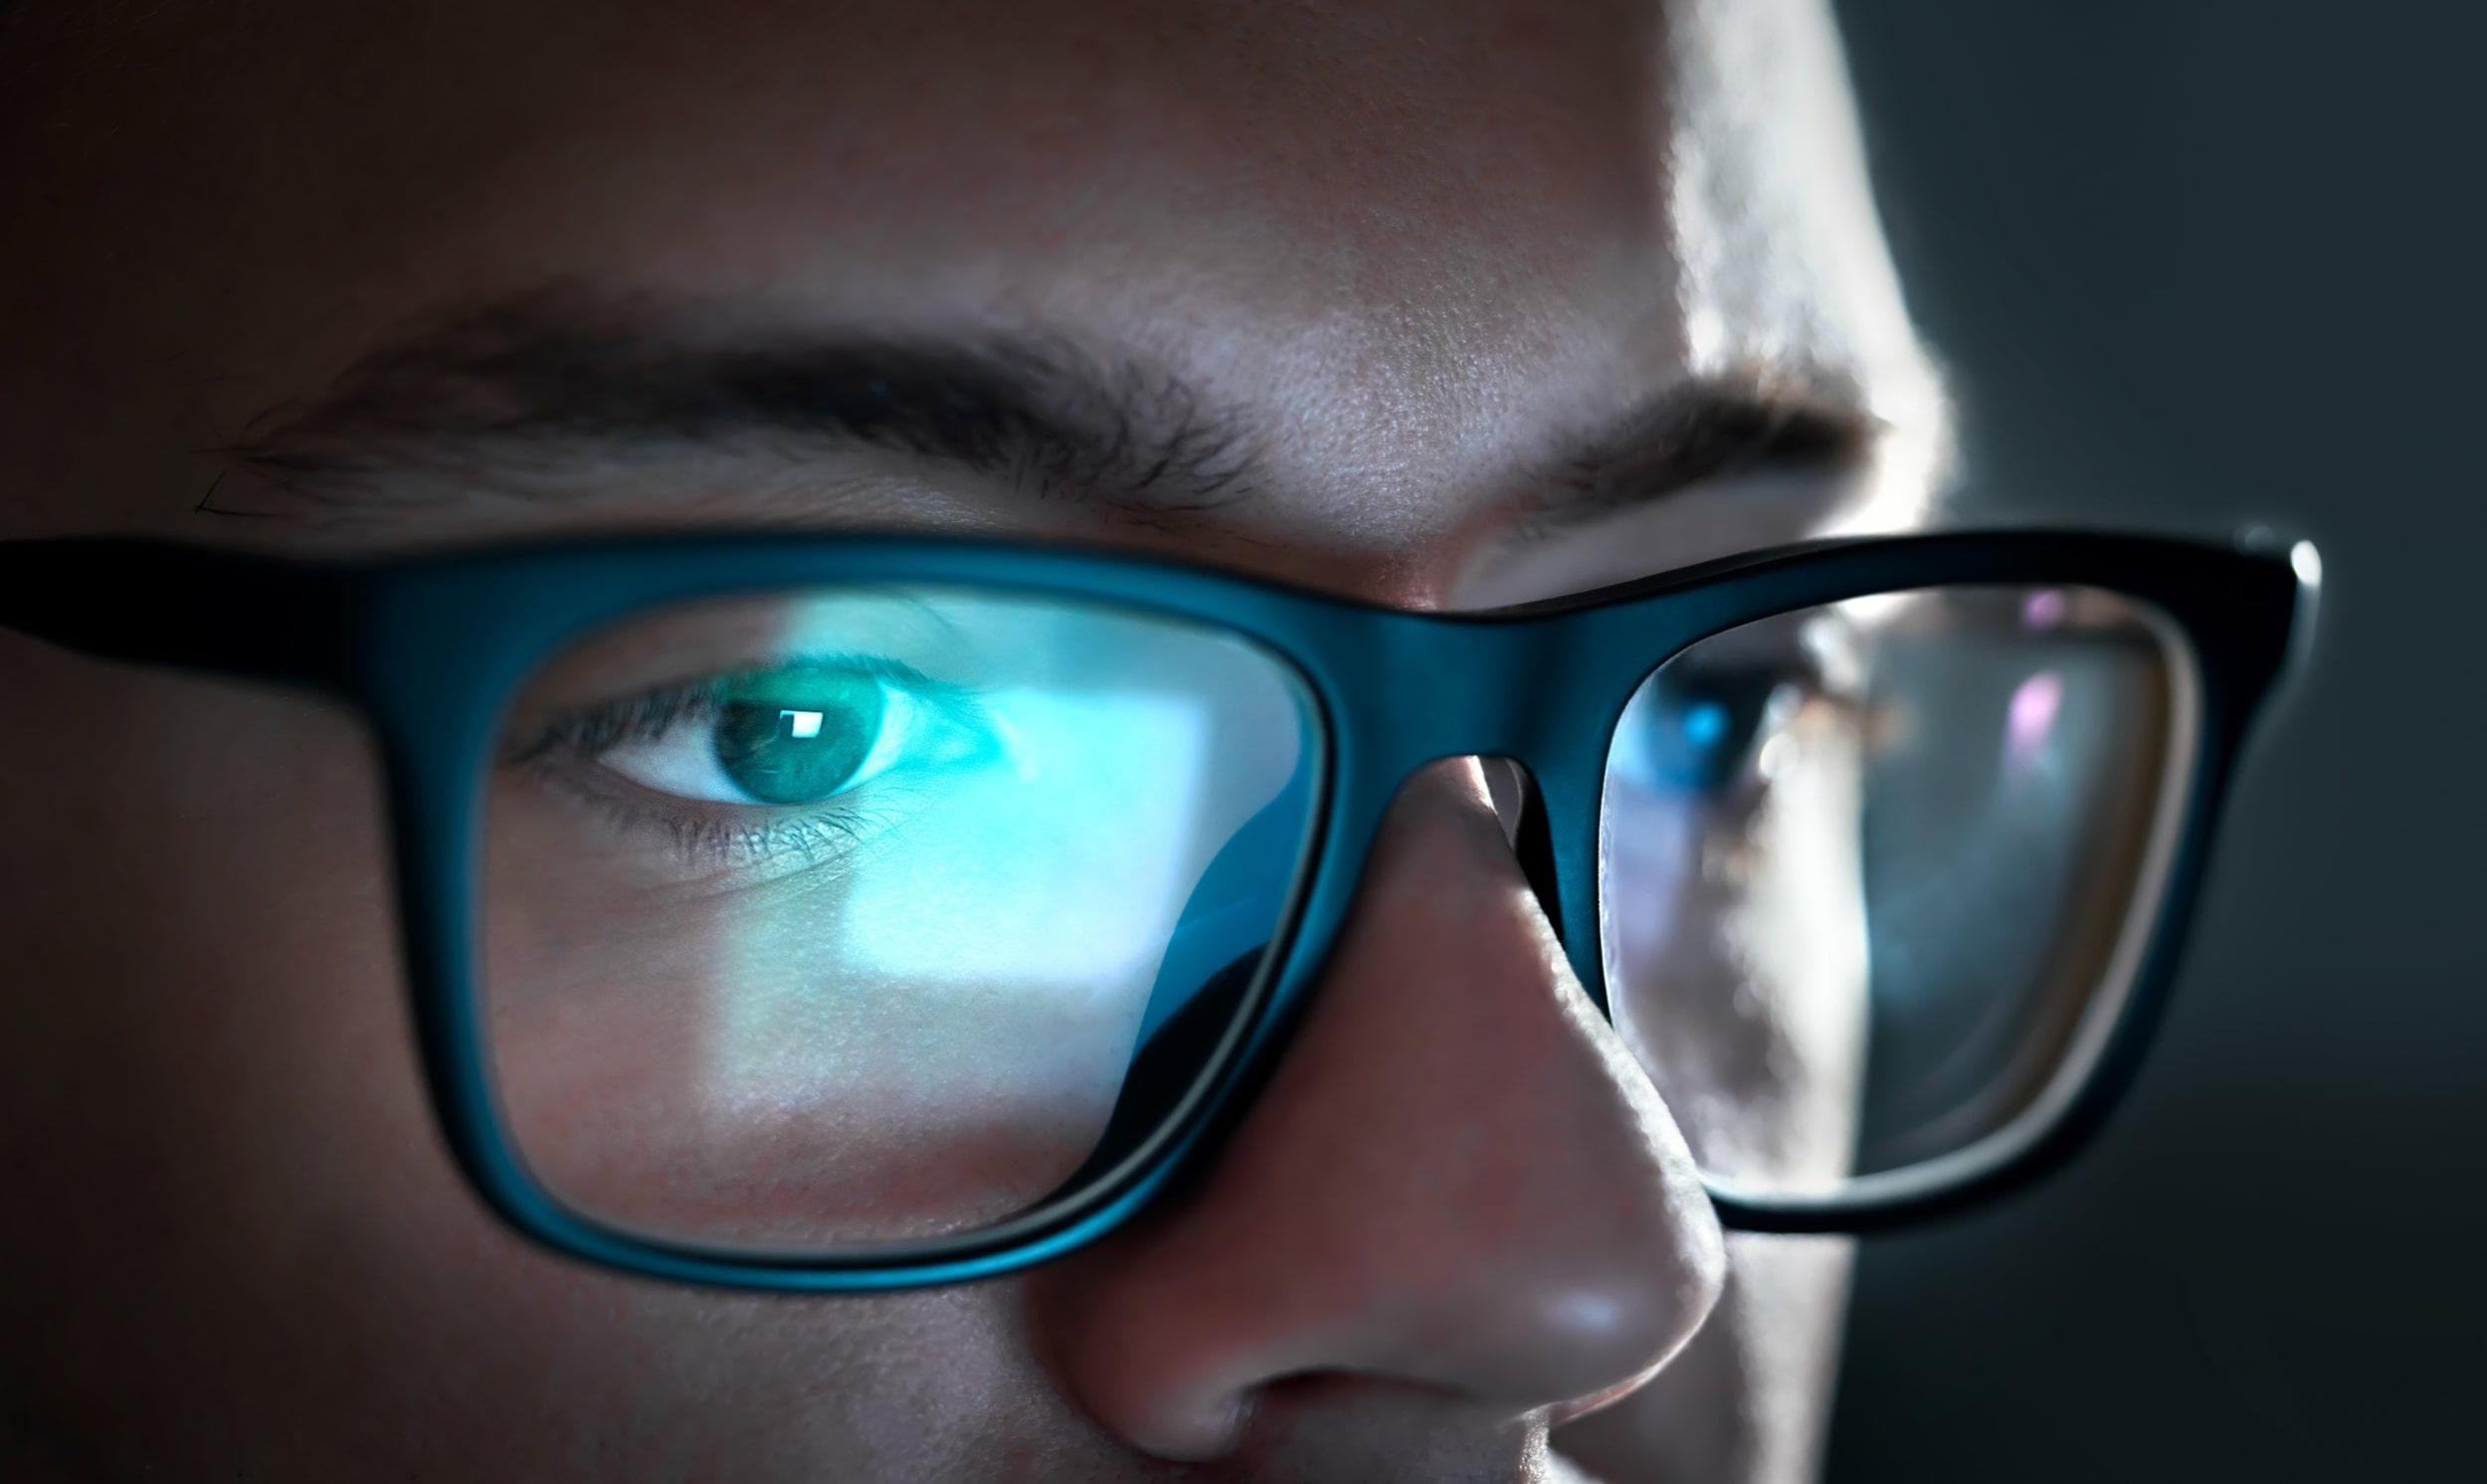 Glare on glasses